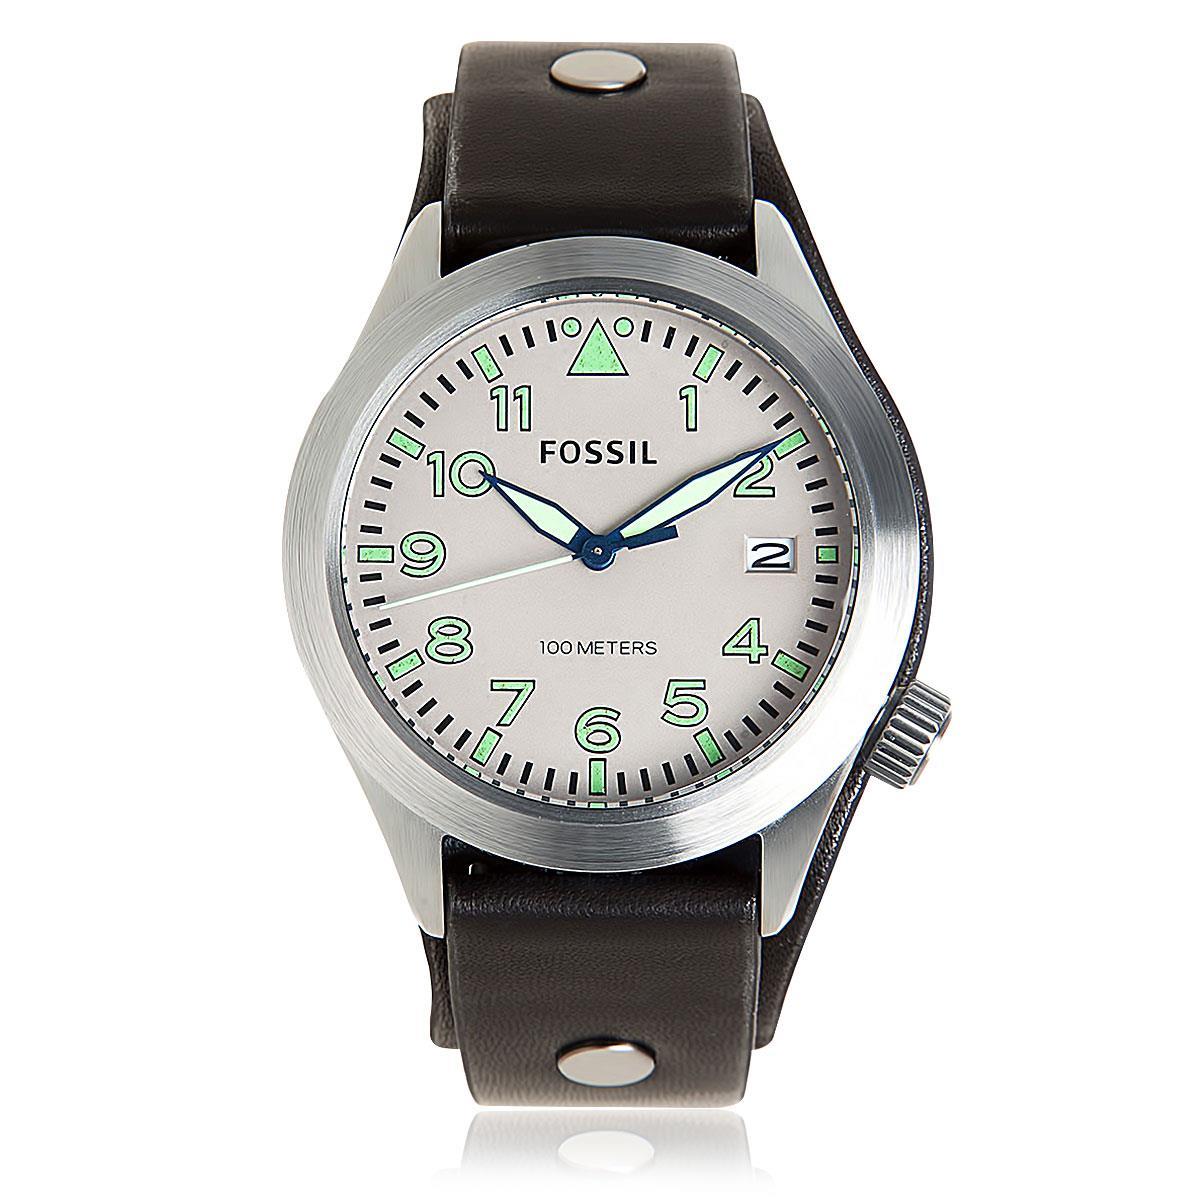 Relógio Masculino Fossil Analógico AM4552 0CN Preto 35d3bcdd65